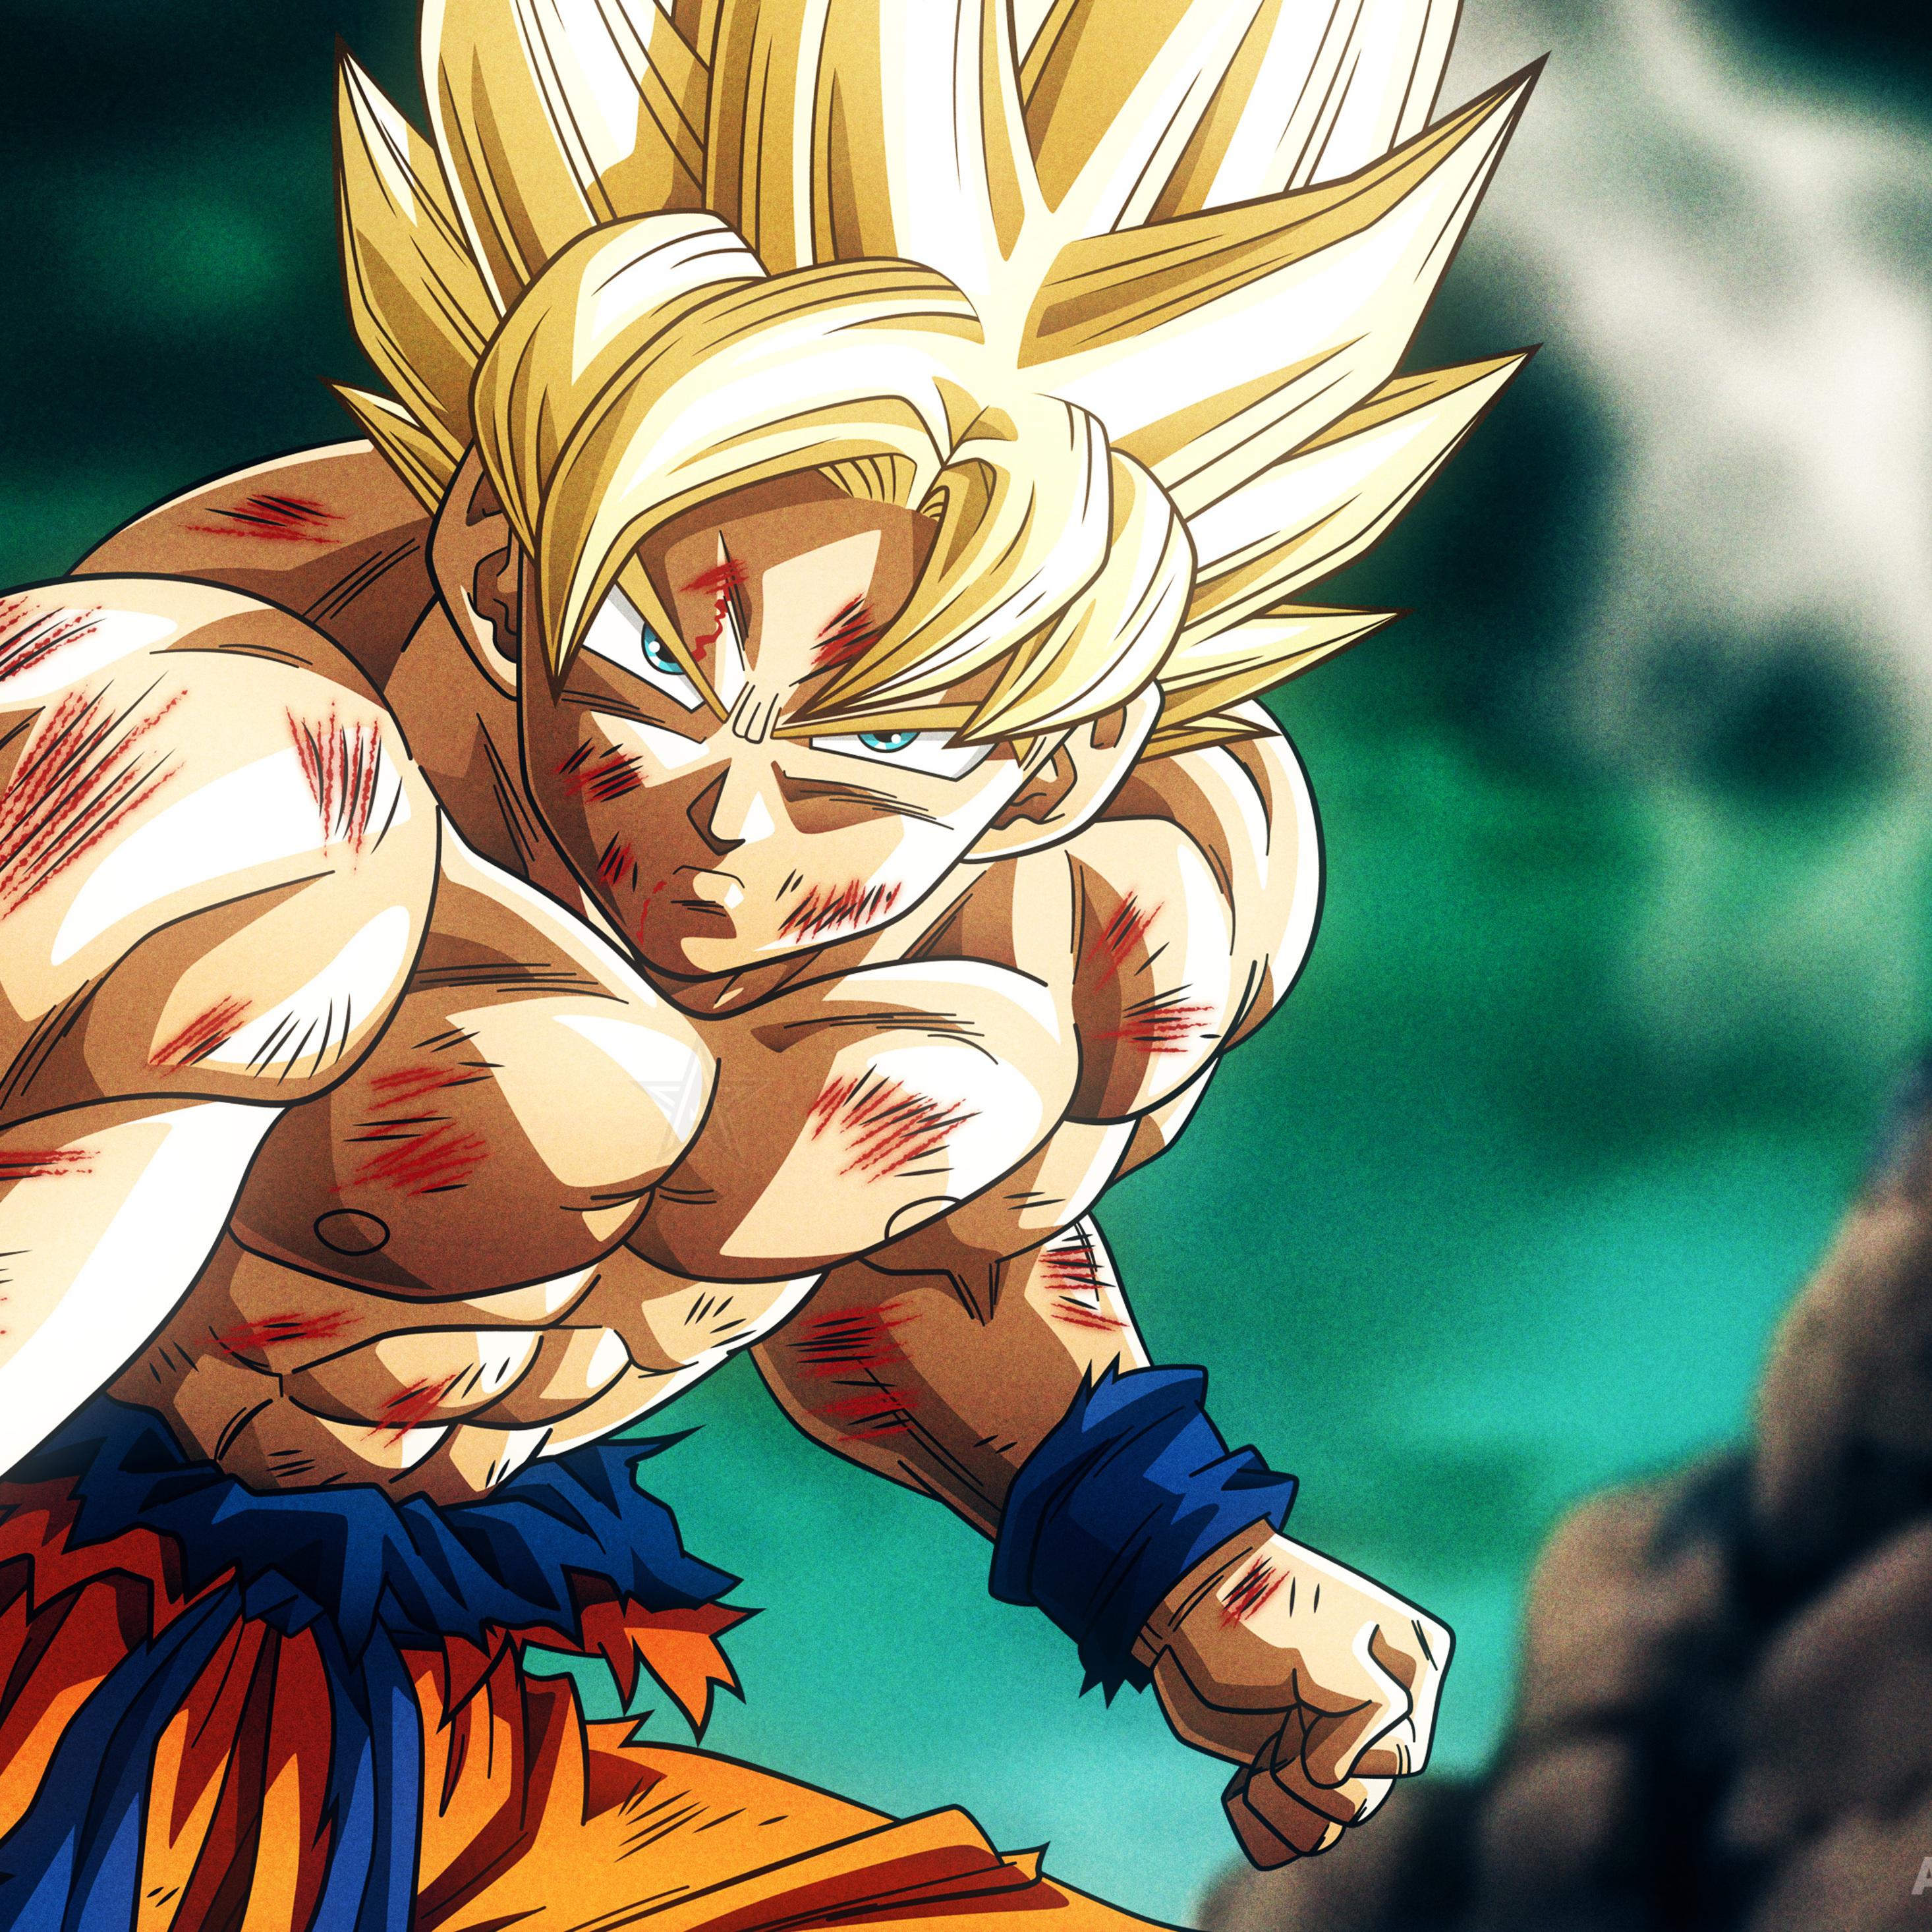 2932x2932 Super Saiyan Son Goku Dragon Ball Z 4k Ipad Pro